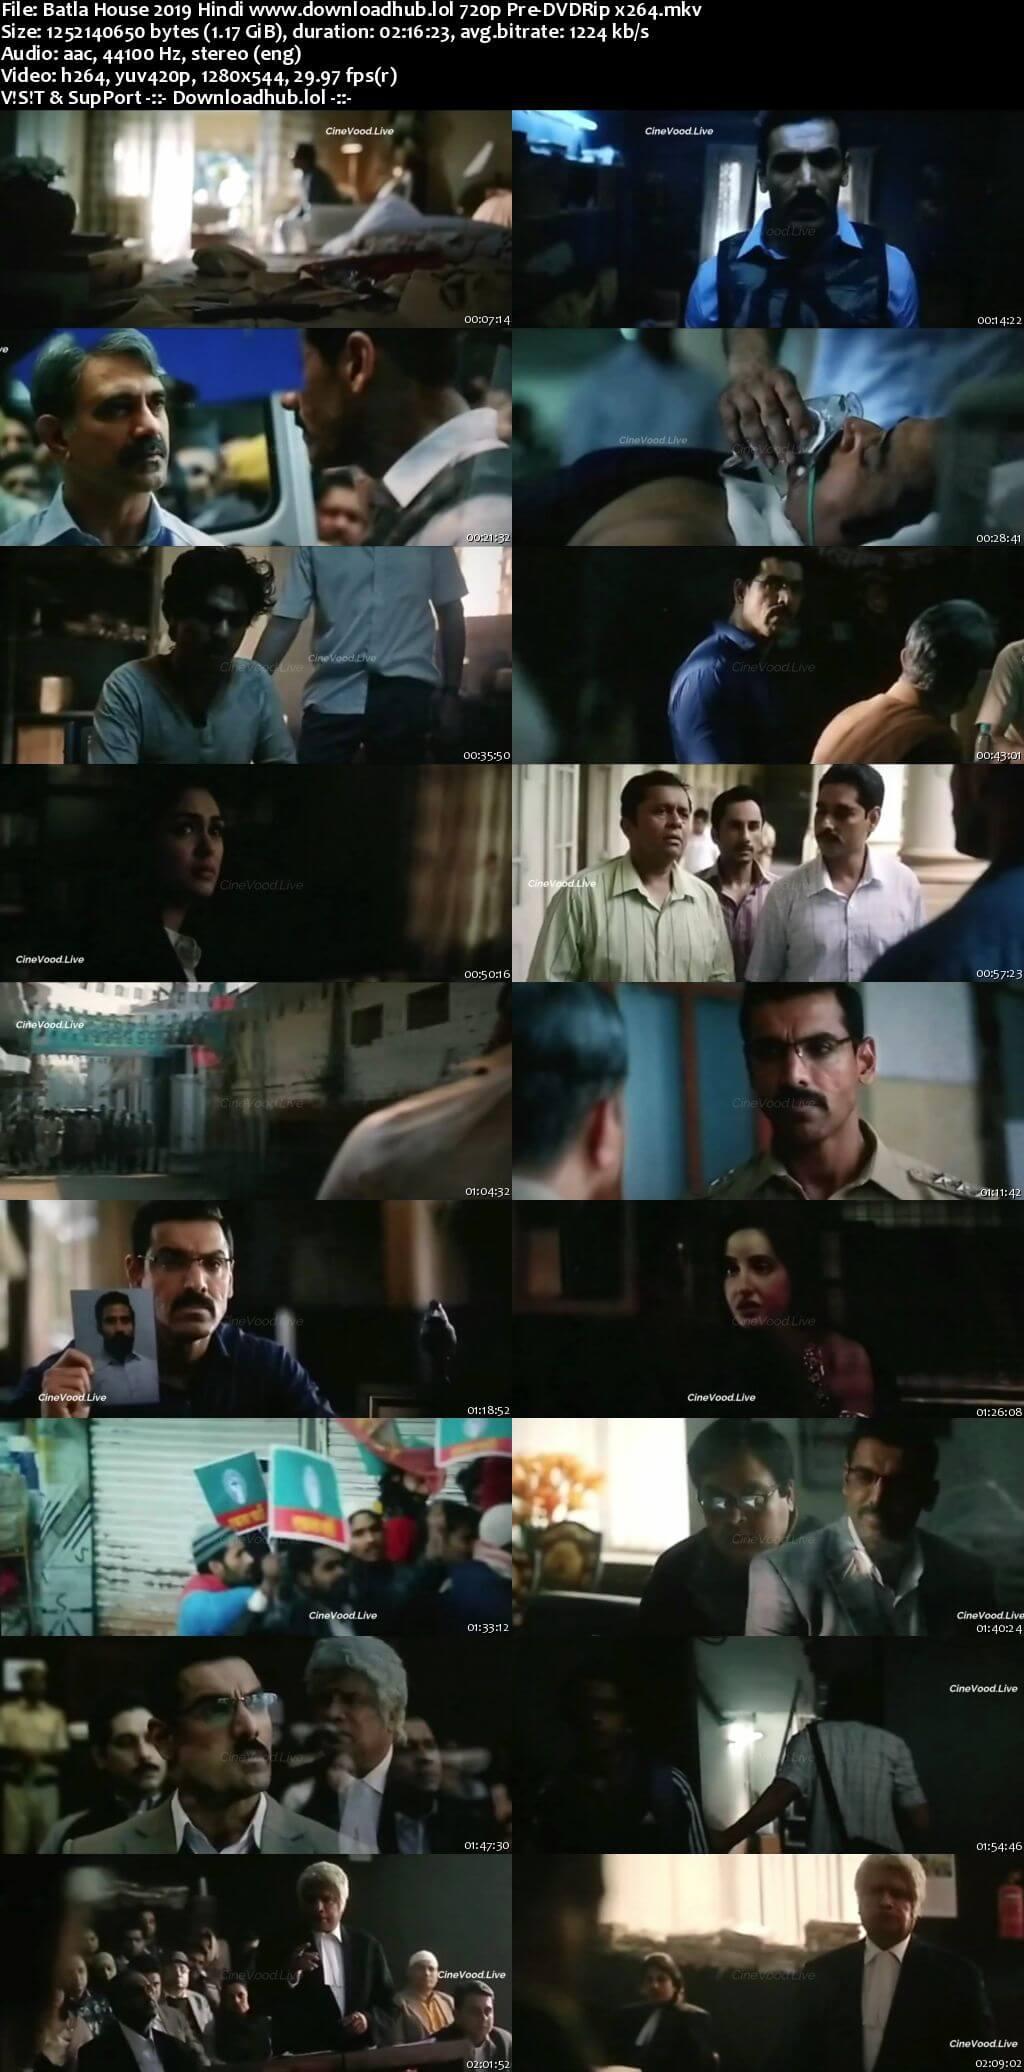 Batla House 2019 Hindi 720p Pre-DVDRip x264